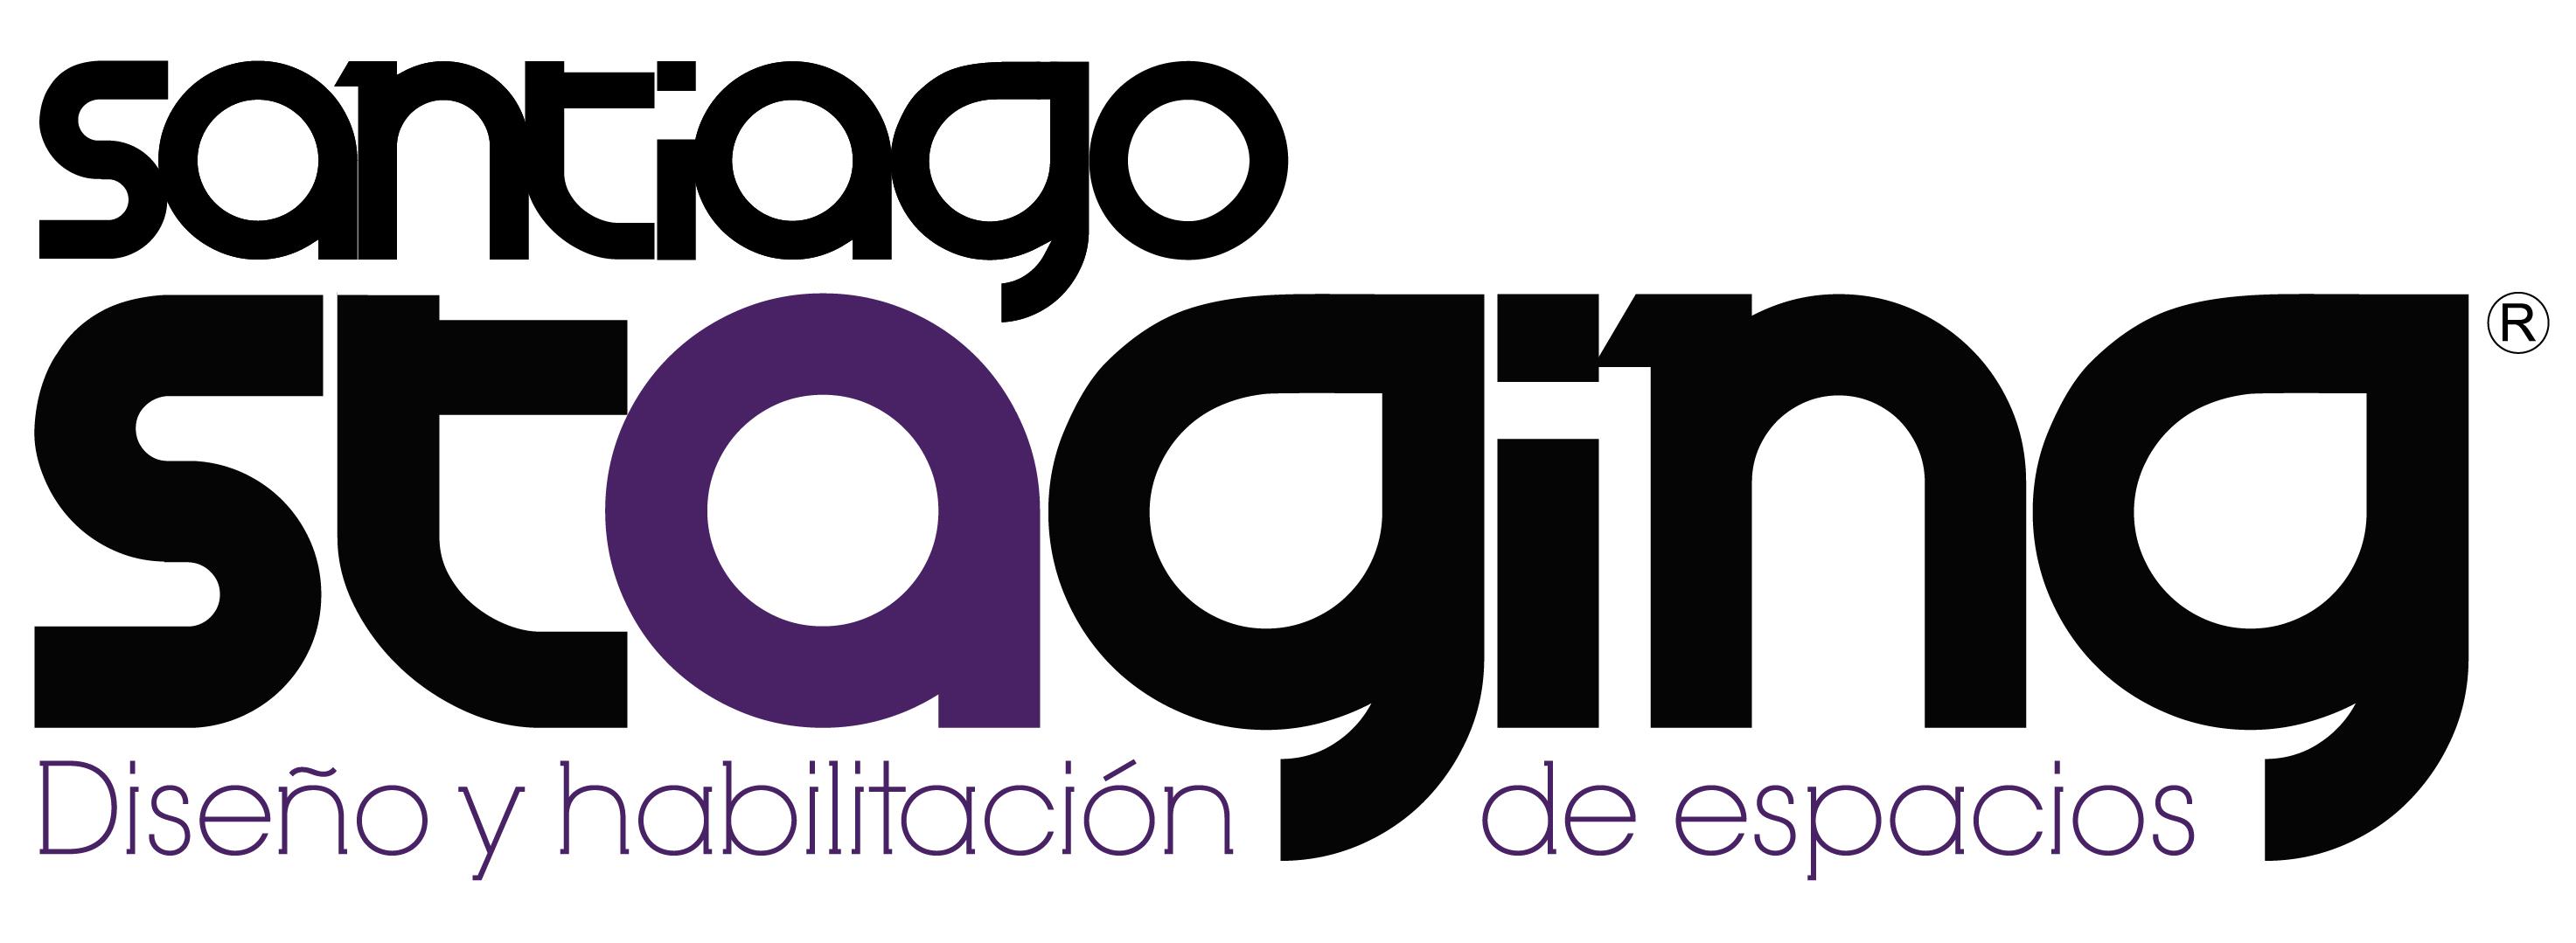 Santiago Staging